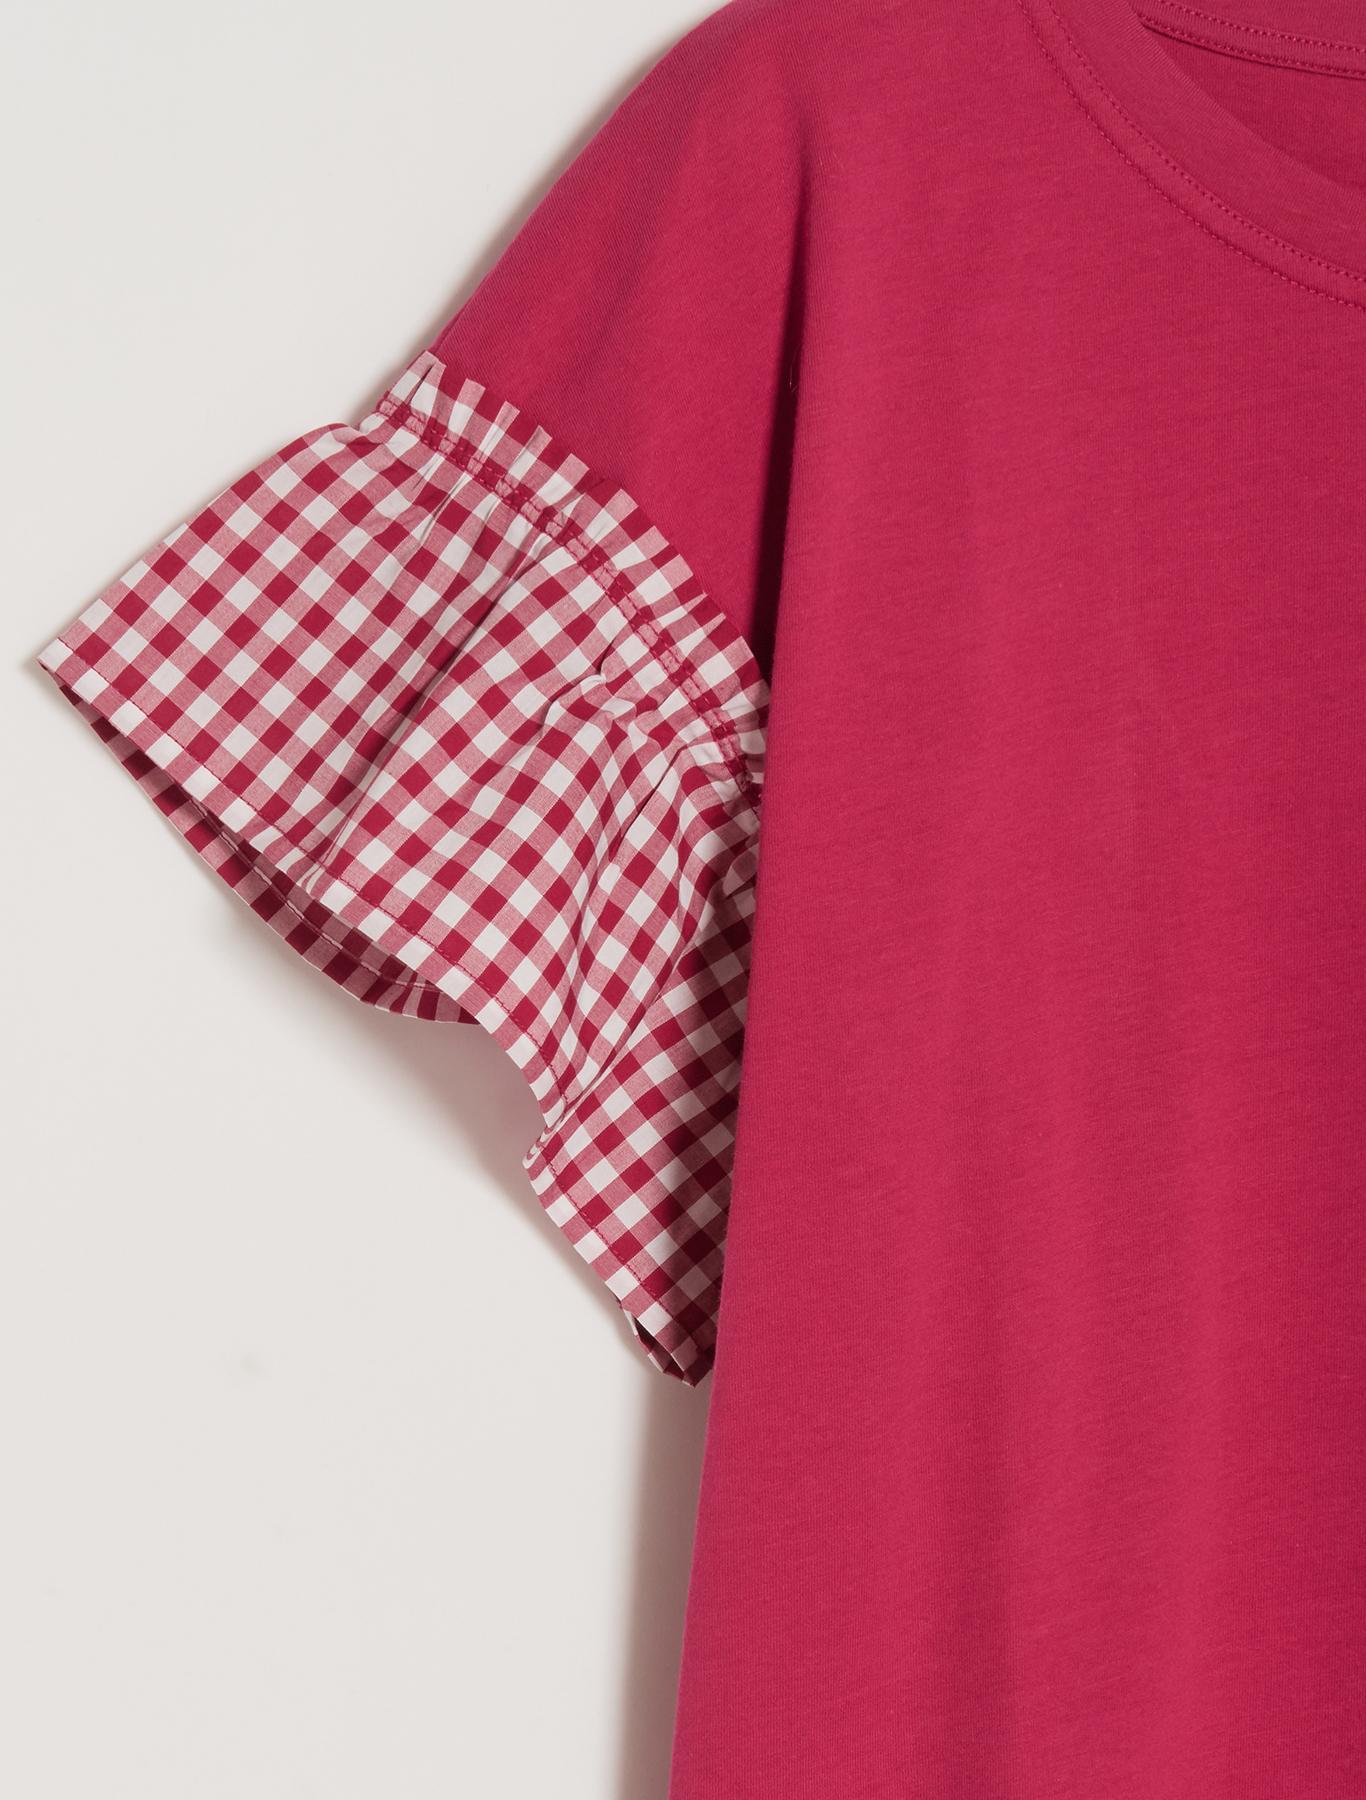 Gingham check T-shirt - fuchsia - pennyblack